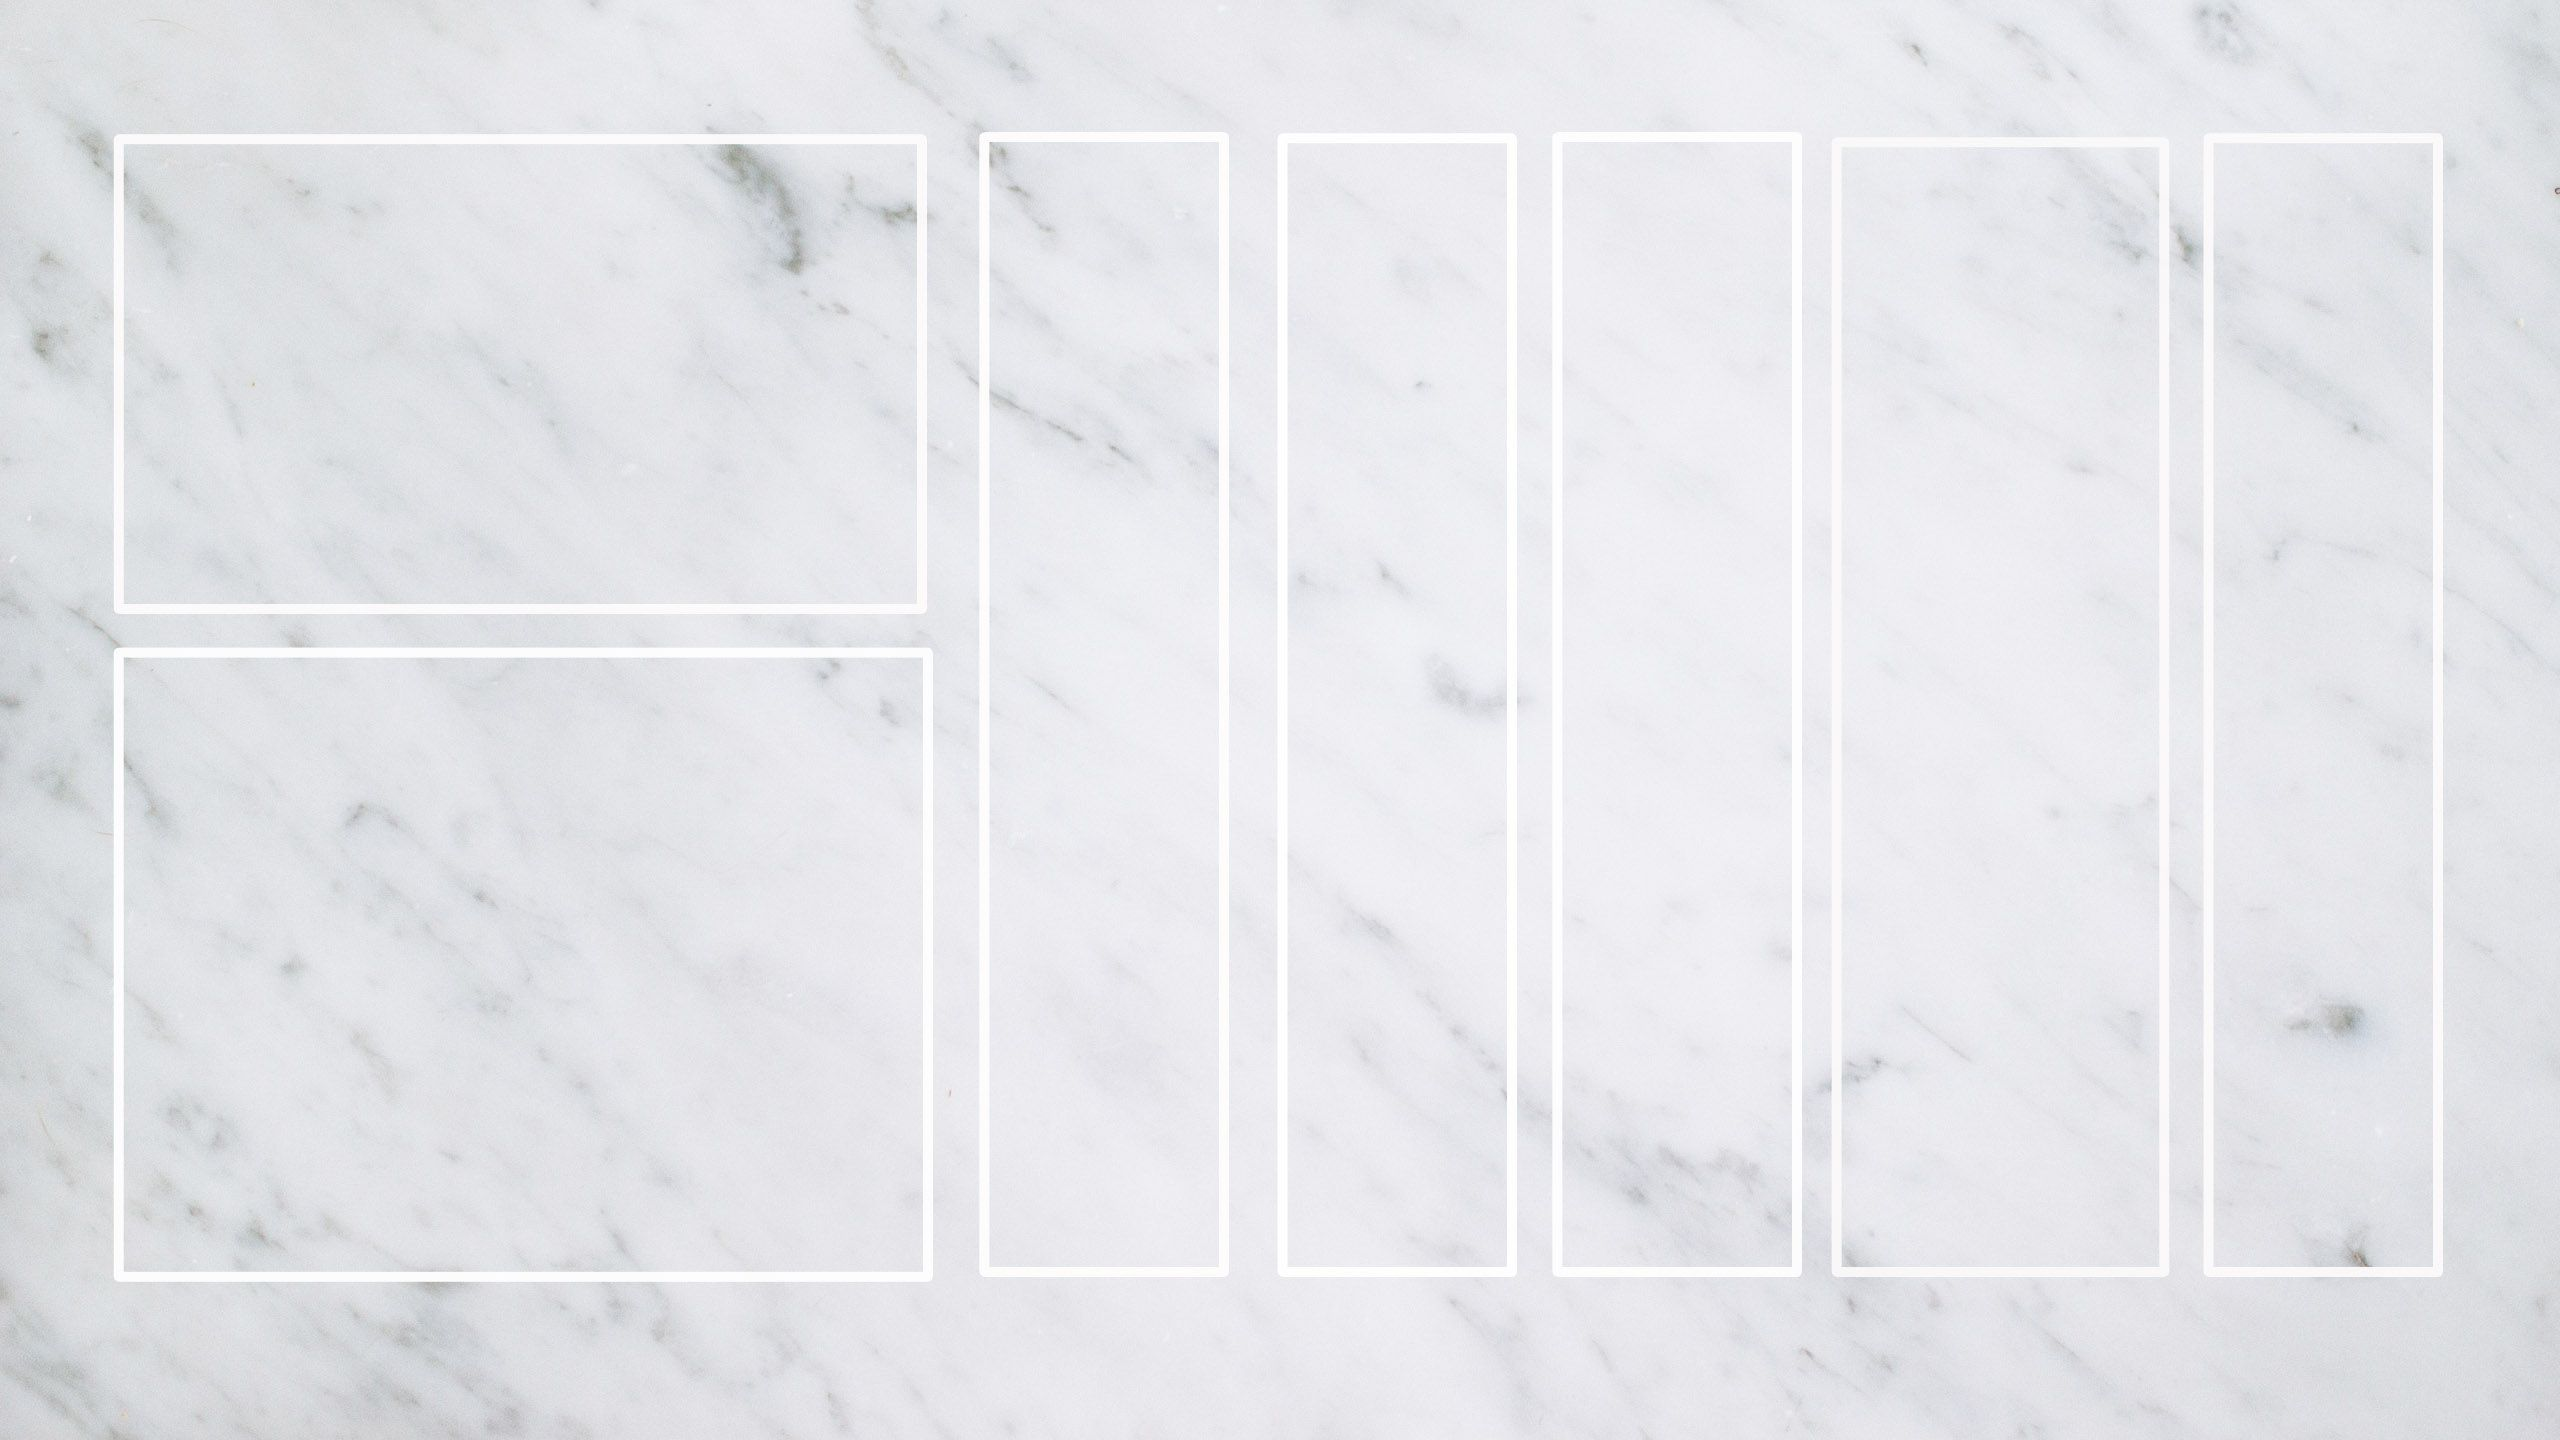 Grey White Blank Marble Desktop Organizer Wallpaper Desktop Wallpaper Organizer Desktop Organization Backgrounds Desktop